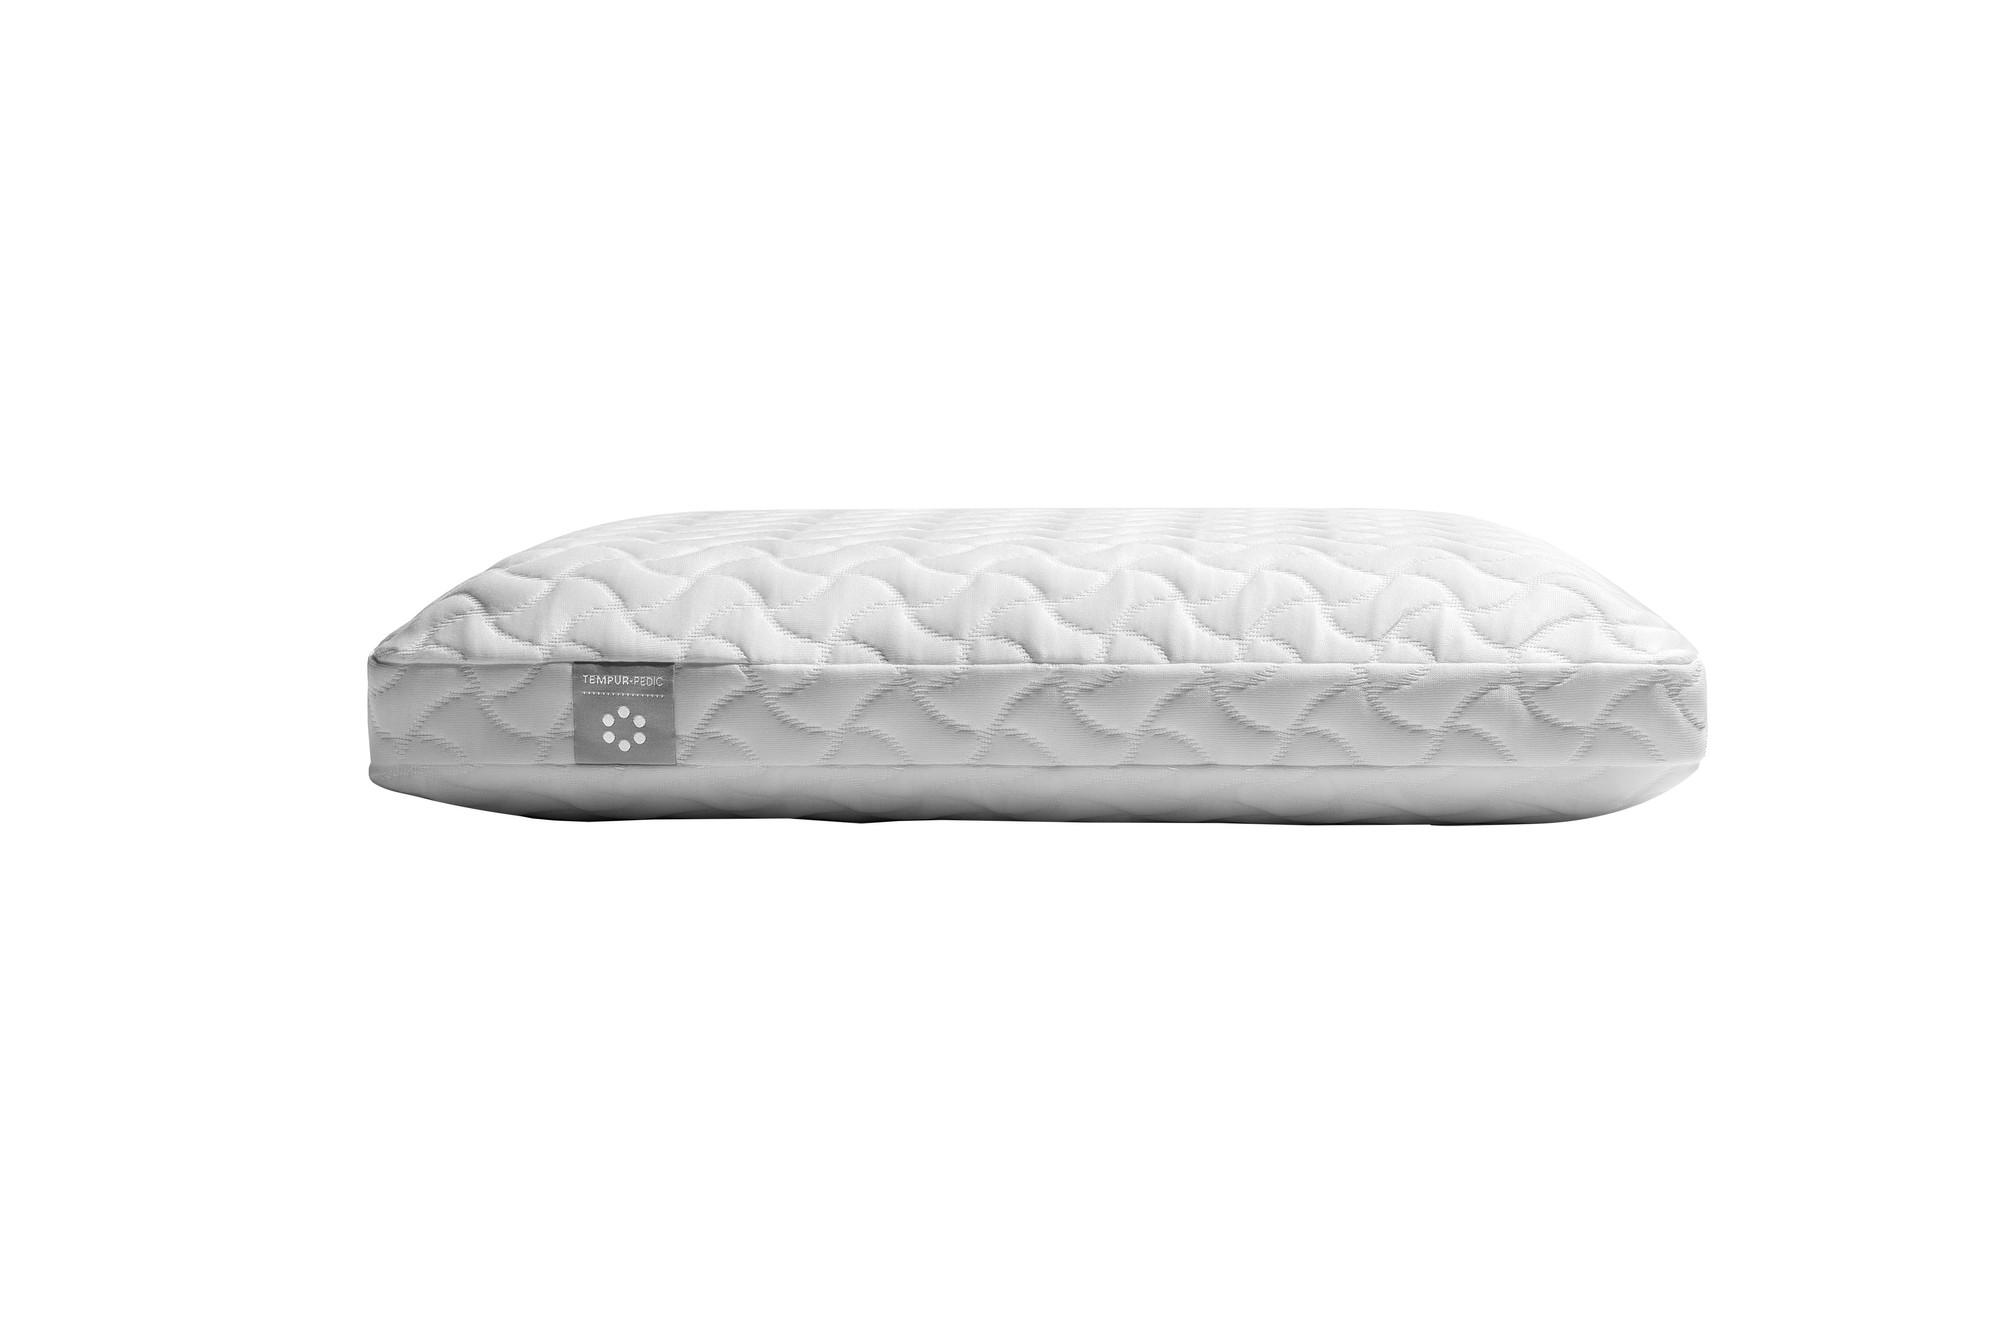 A tempur-cloud pillow showing the profile